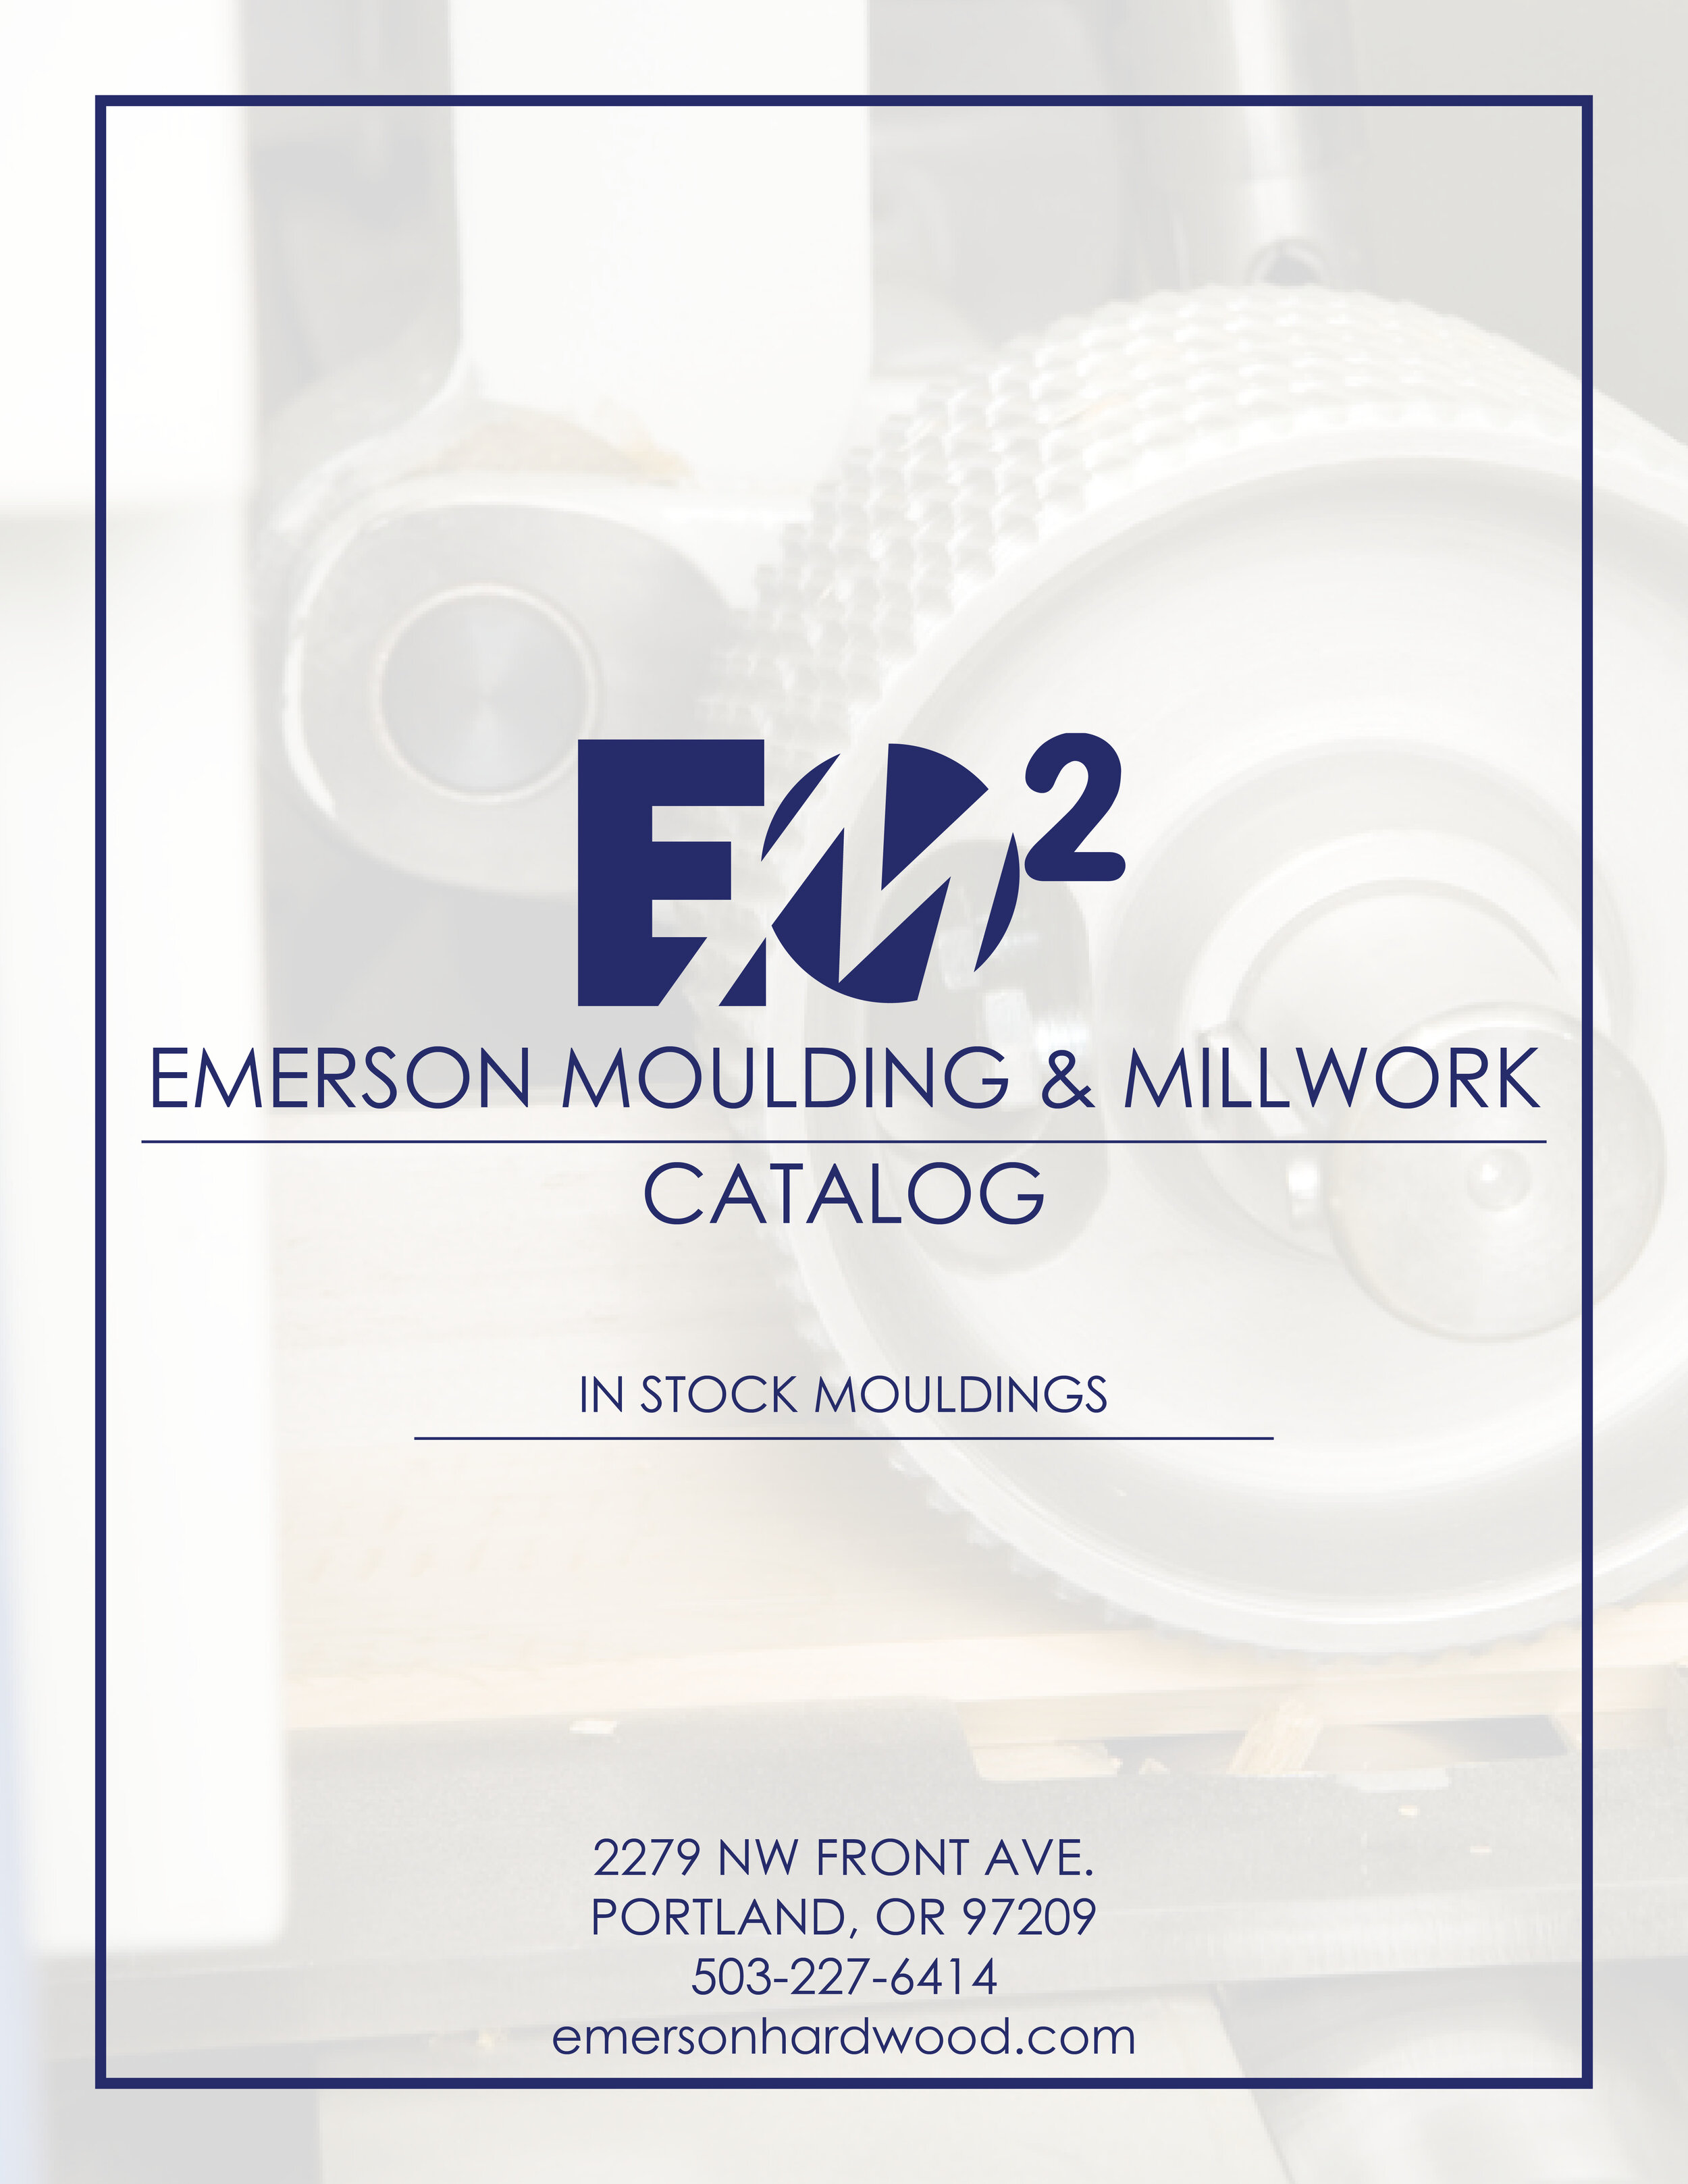 Em2 Molding Millwork Emerson Hardwood Group